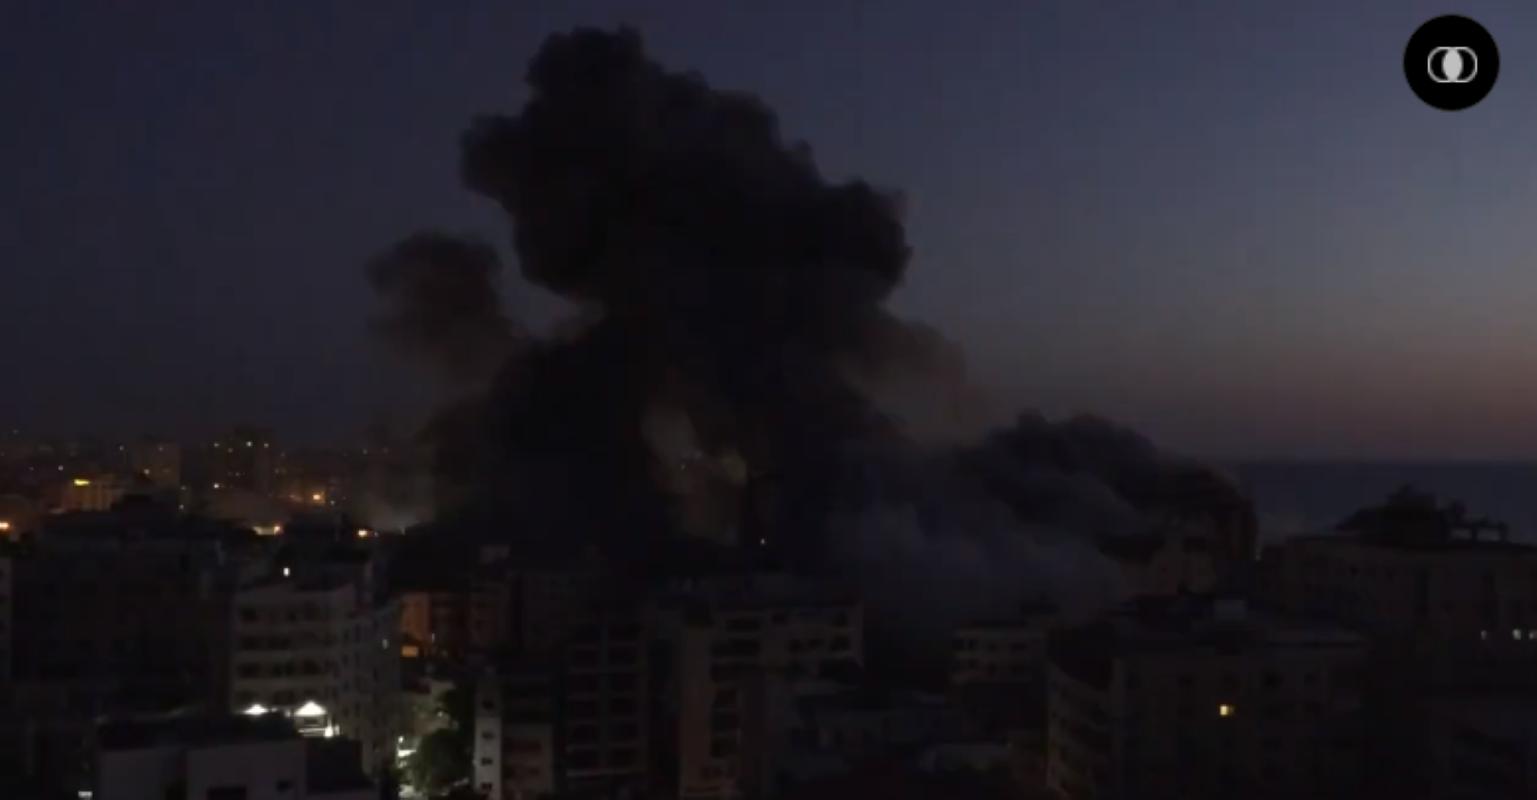 Bi Israel danh sap nha, Hamas phong mua phao phan luc dap tra-Hinh-6